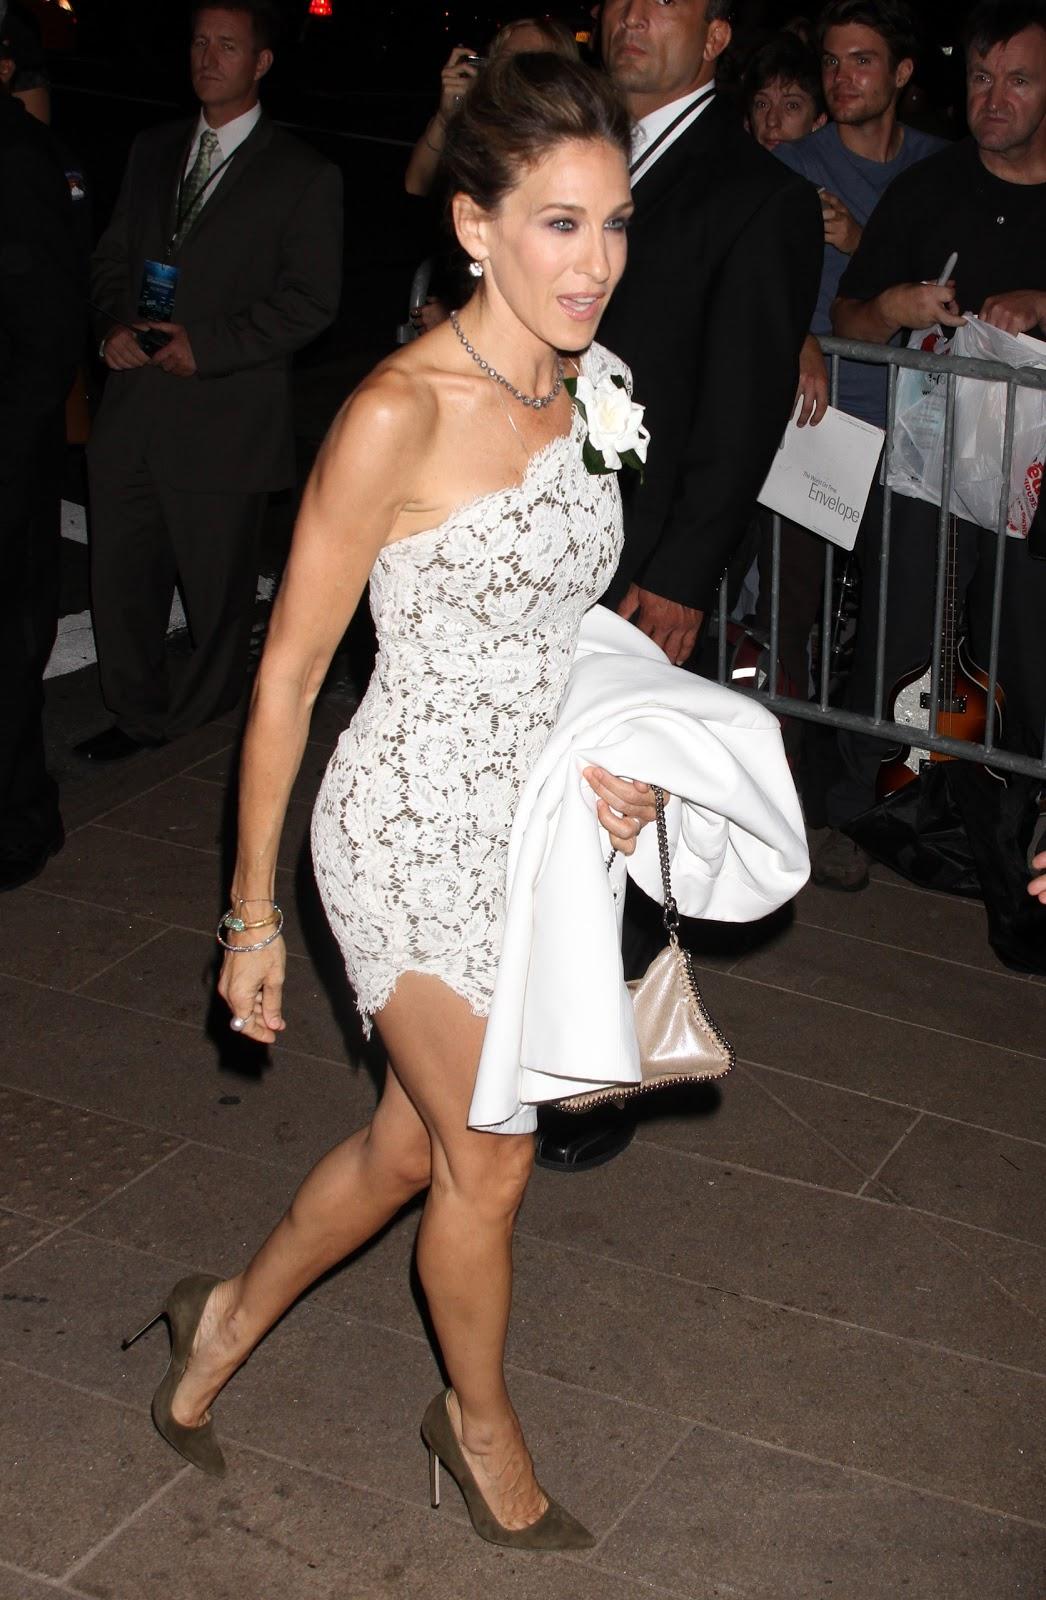 http://2.bp.blogspot.com/-1ez6NZWTeic/ToMD6Qds2kI/AAAAAAAABhs/MINtoIXVkUs/s1600/Sarah_Jessica_Parker_Ballets_Gala_Opening_in_NYC_September_22_2011_05_122_45lo.jpg